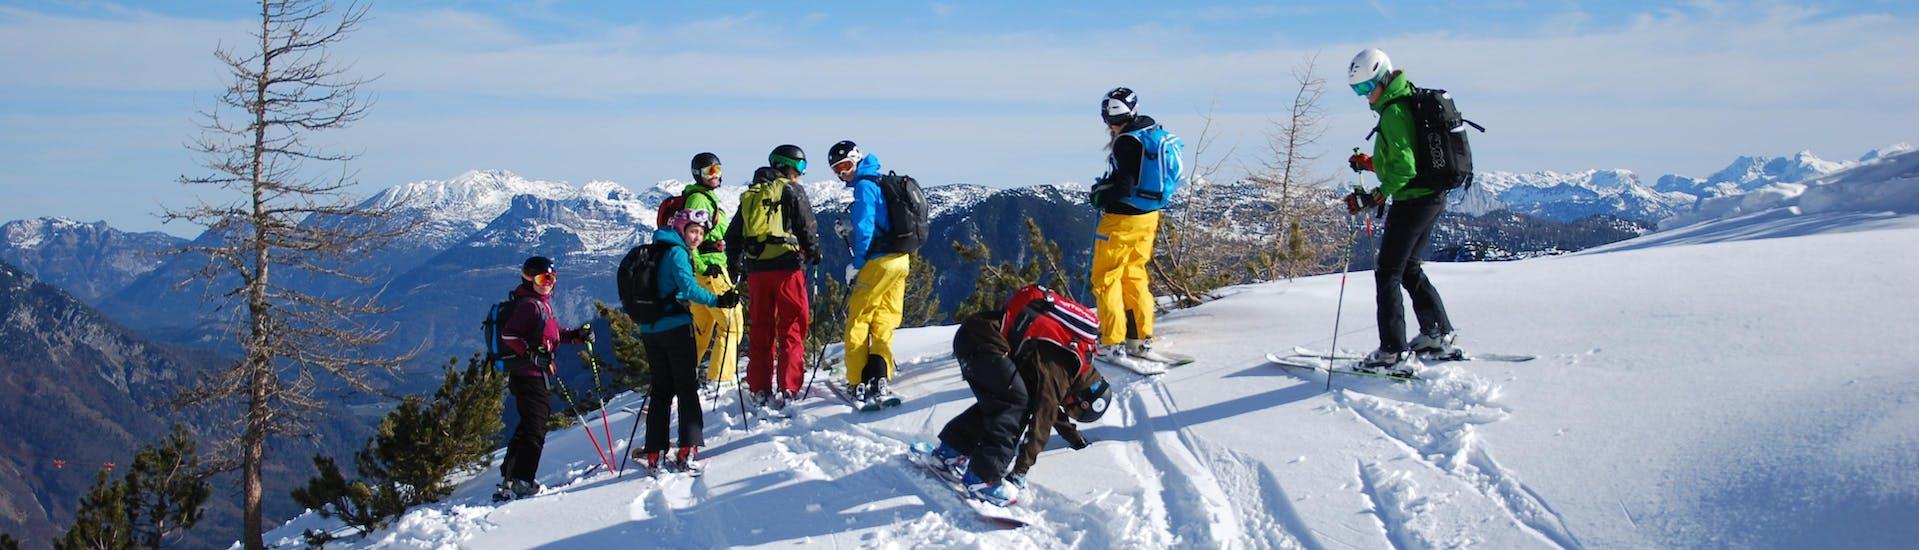 "Ski Instructor Private ""Super 3"" for Adults avec Skischule Gosau - Hero image"